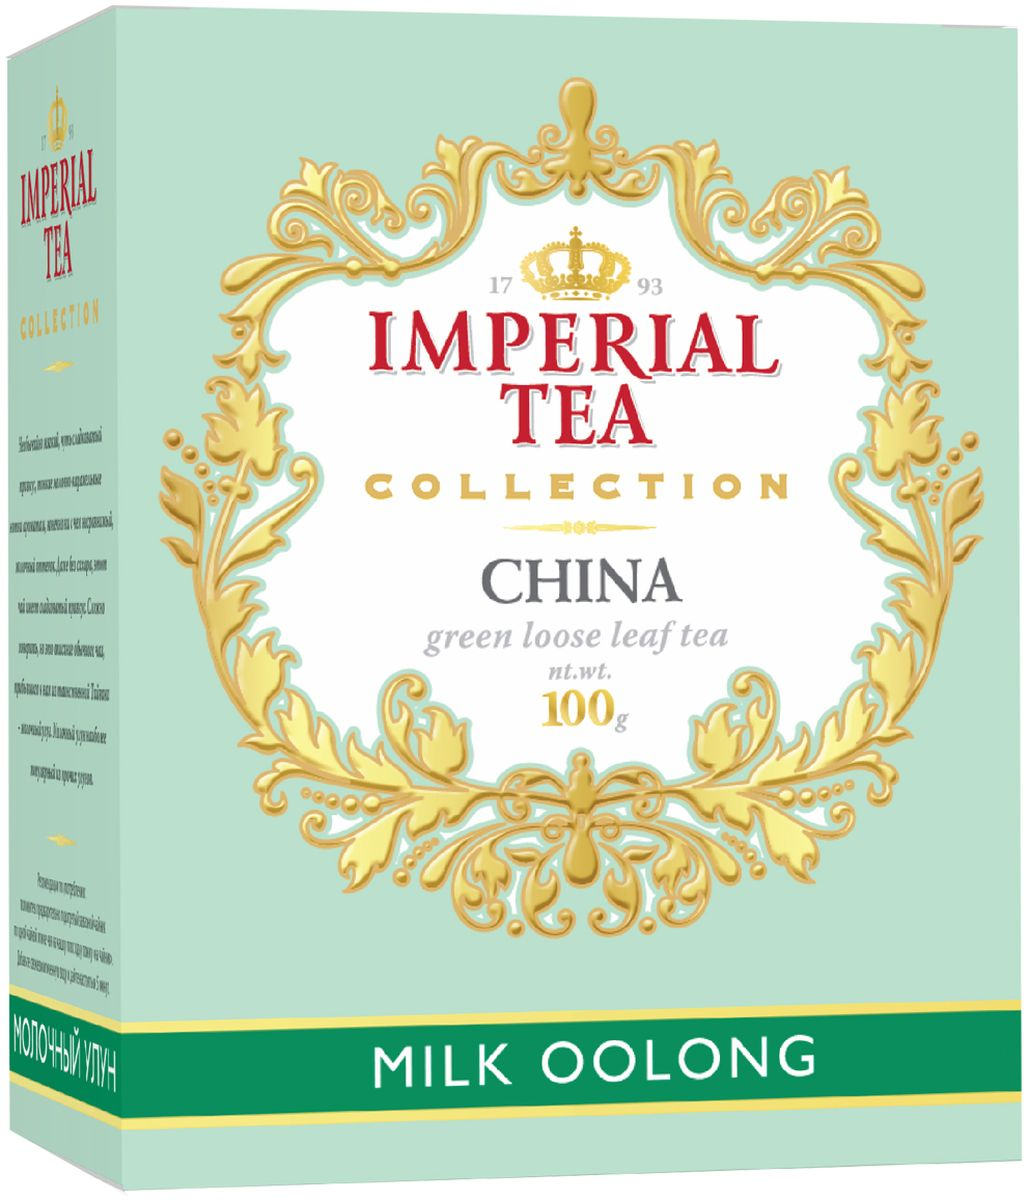 Фото Императорский чай Collection Молочный Улун, 100 г